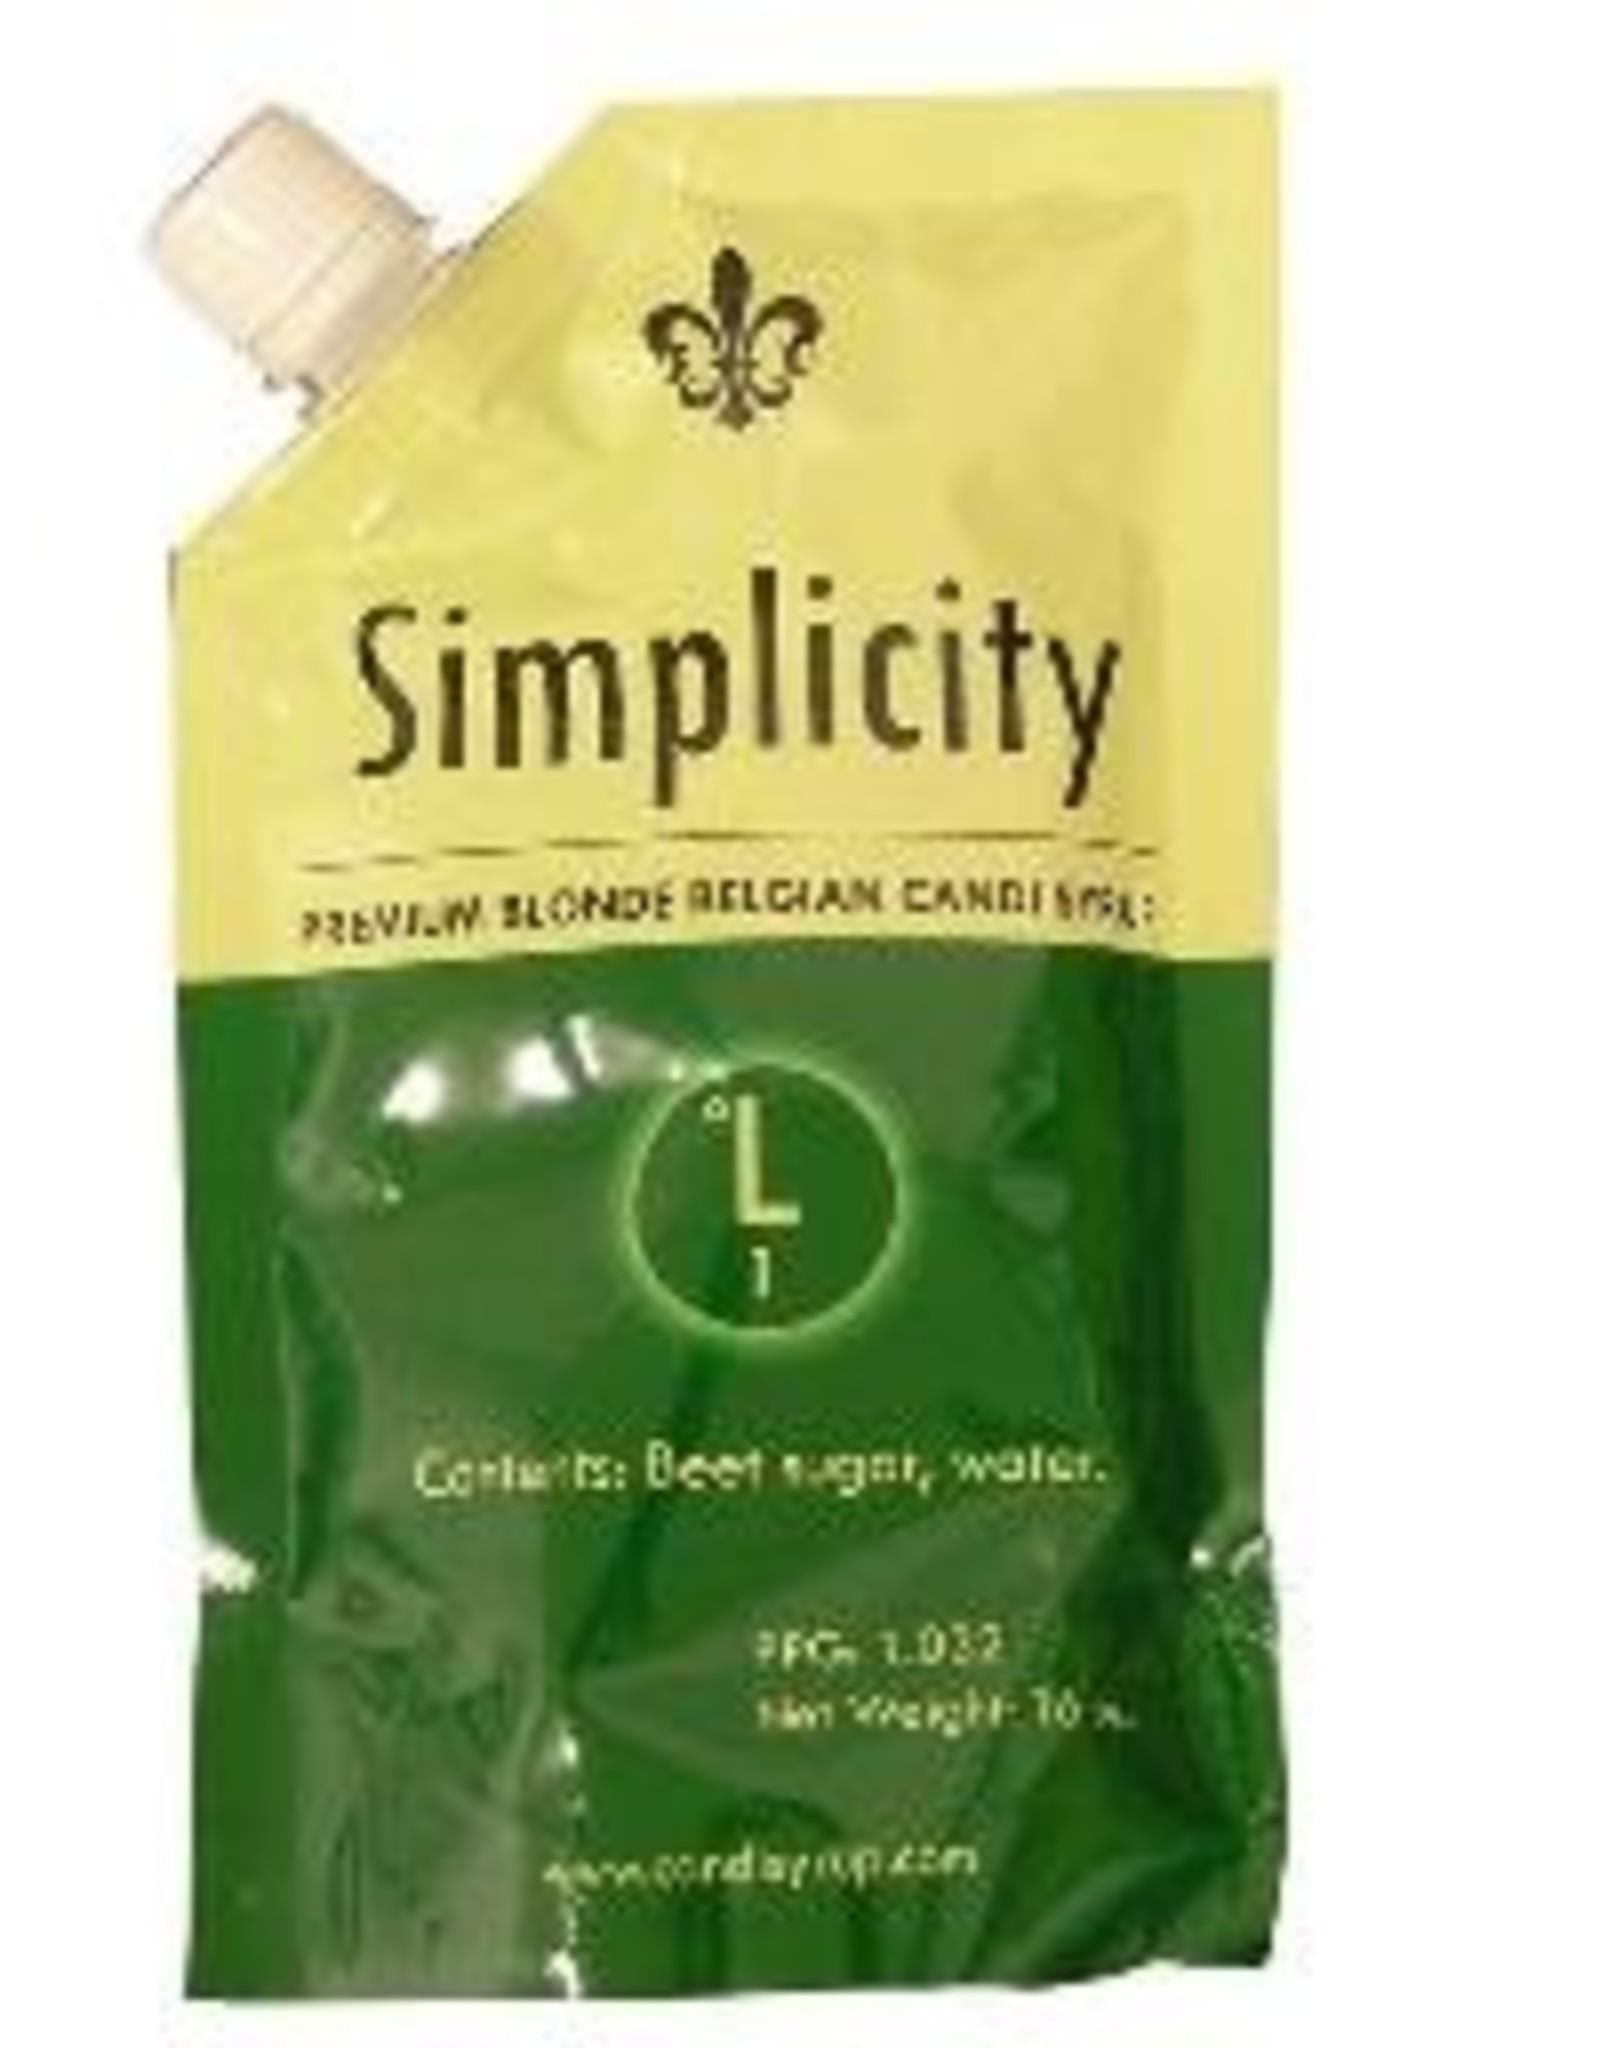 SIMPLICITY BELGIAN CANDI SYRUP 0 LOVIBOND 1 LB POUCH